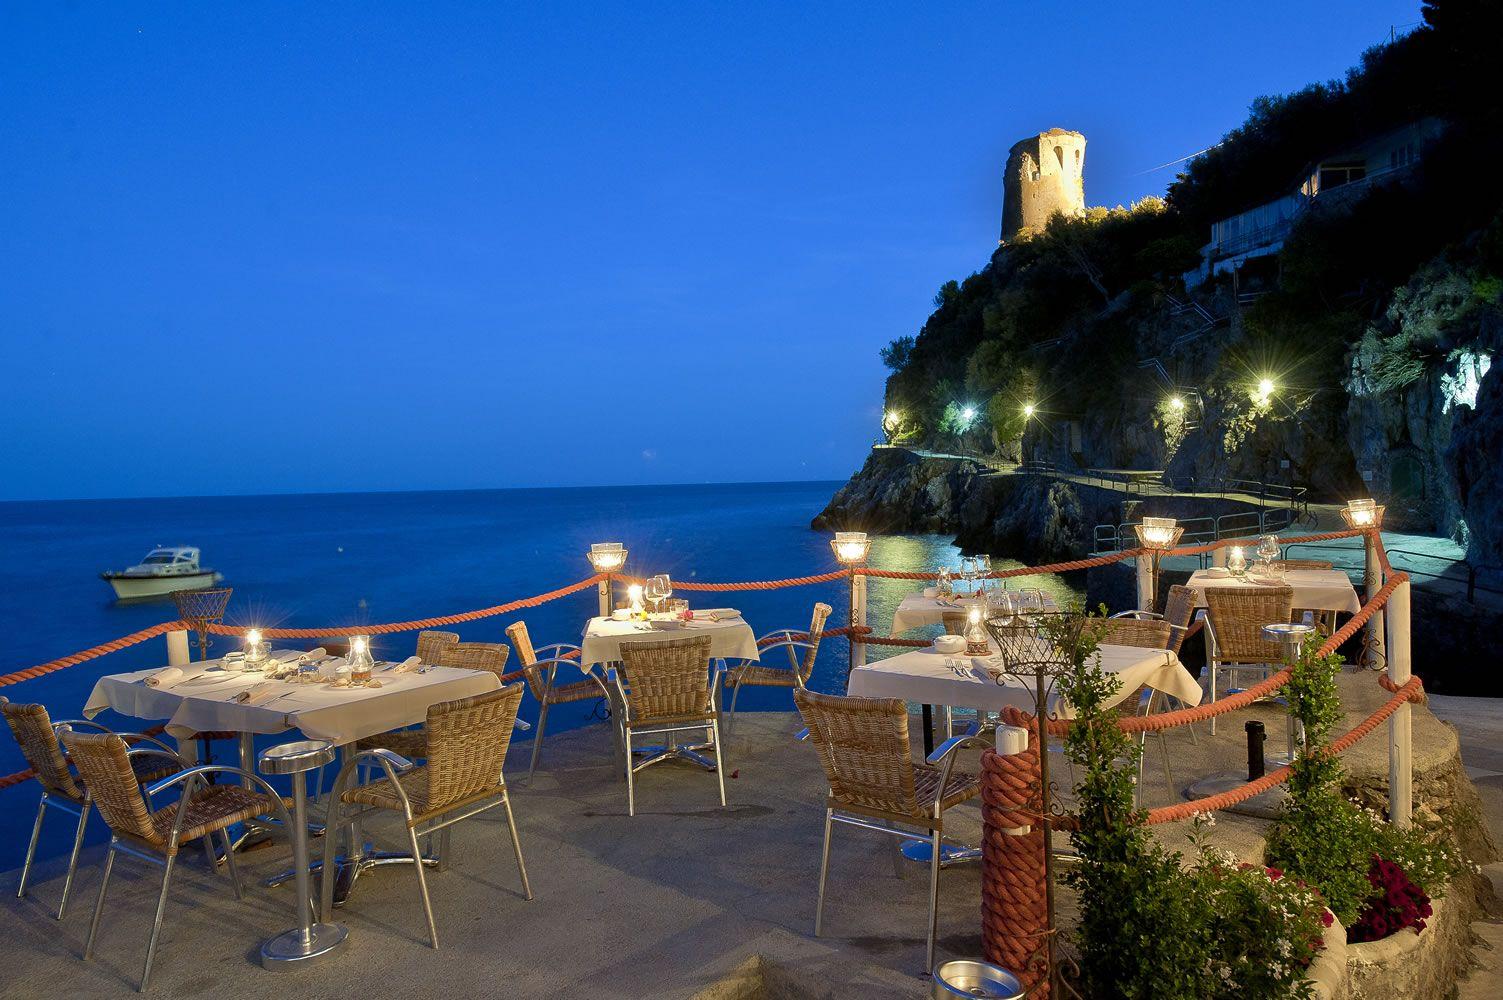 ii pirata Google Search Amalfi coast, Praiano italy, Italy